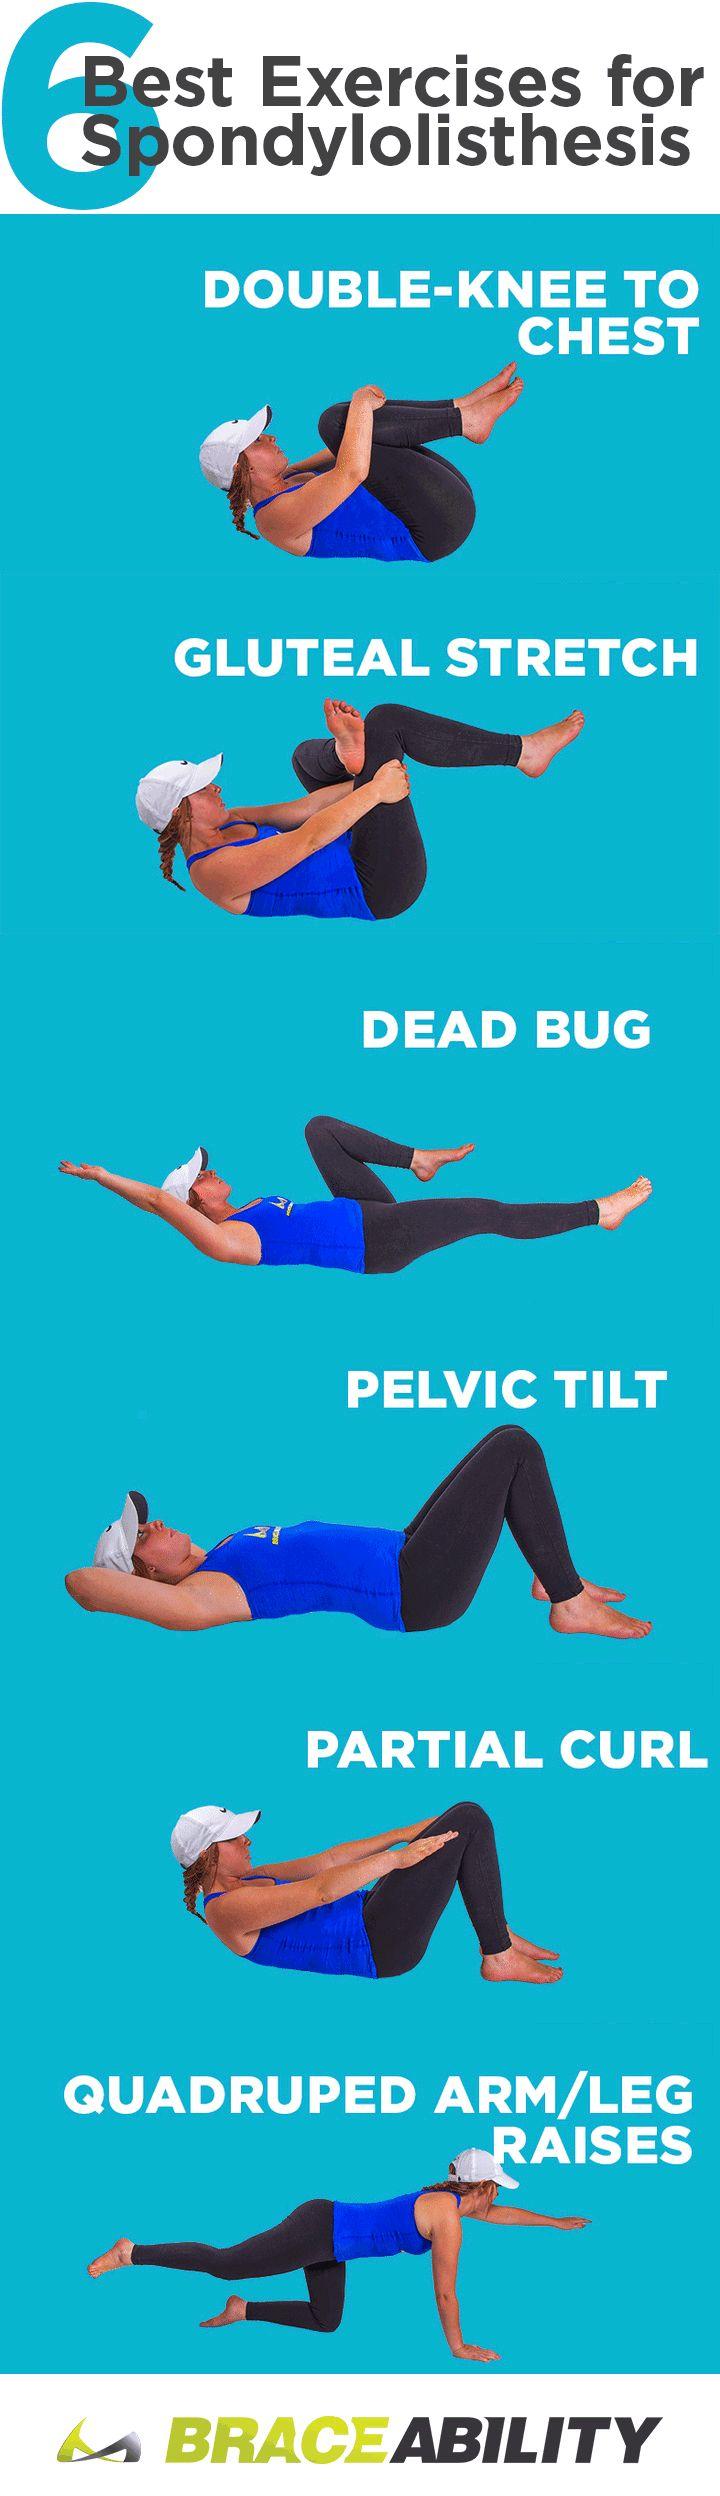 Exercises for spondylolithesis